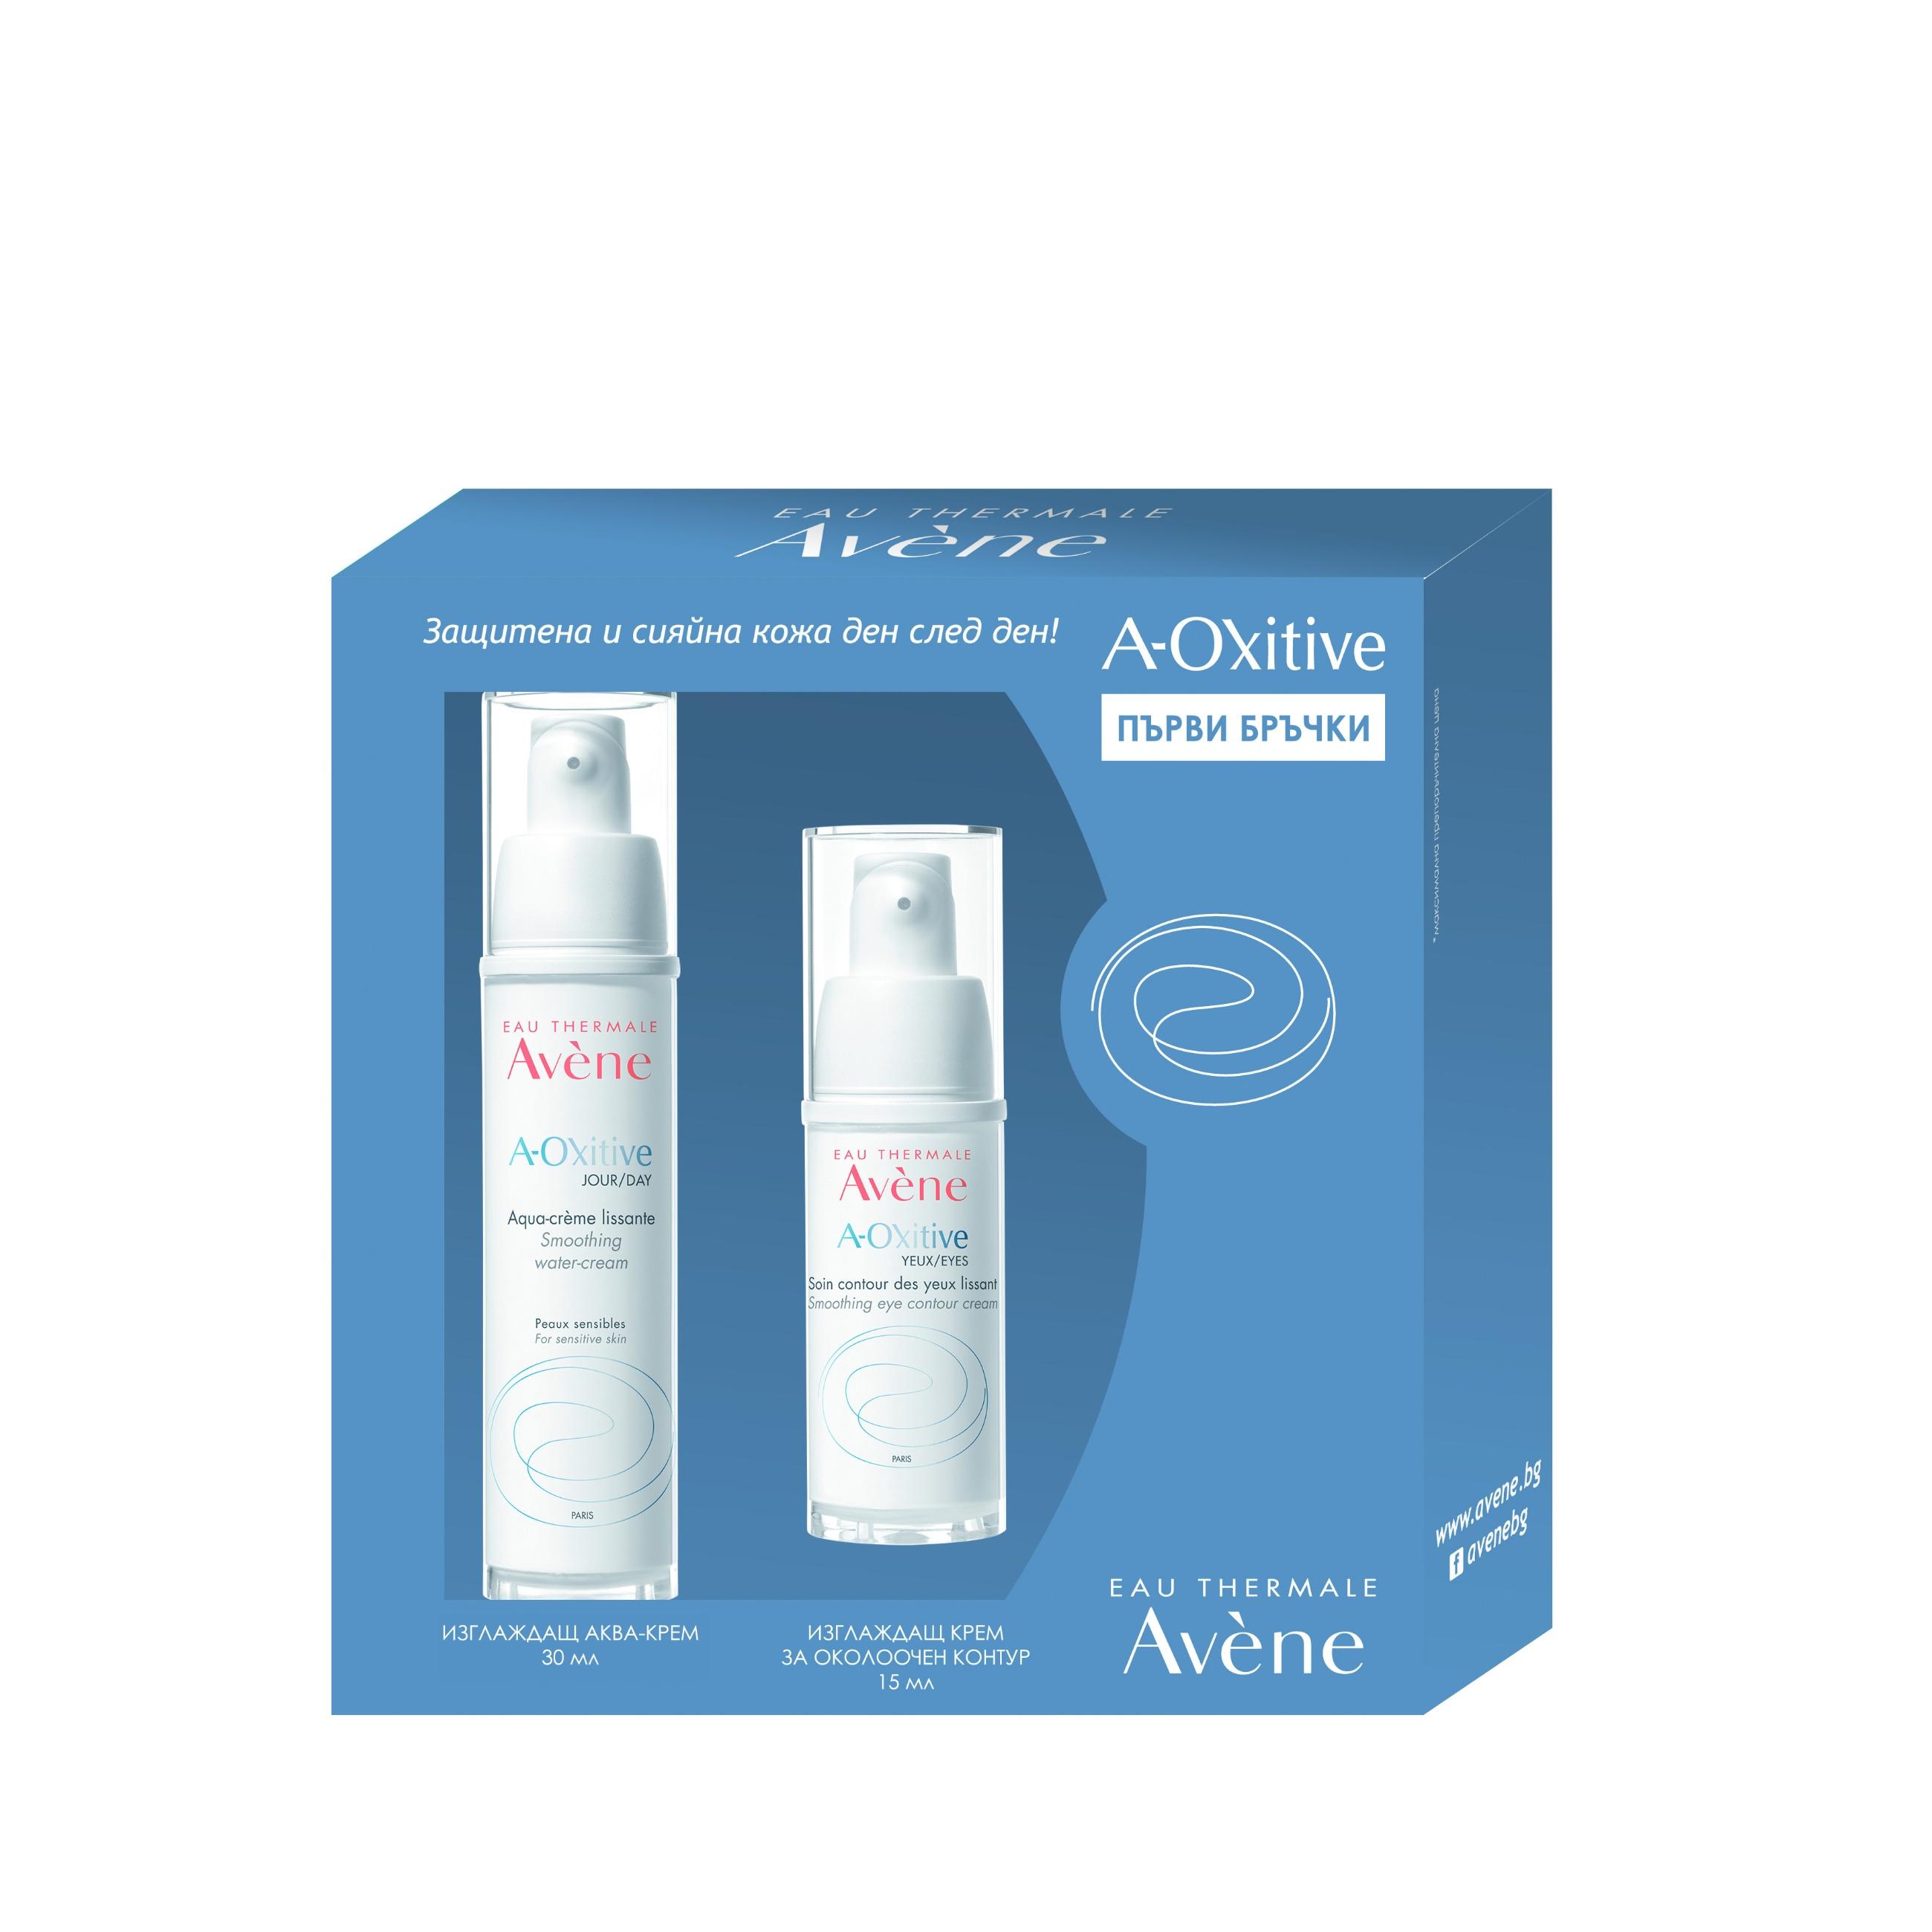 Avene A-oxitive изглаждащ крем за лице 30мл + A-oxitive..